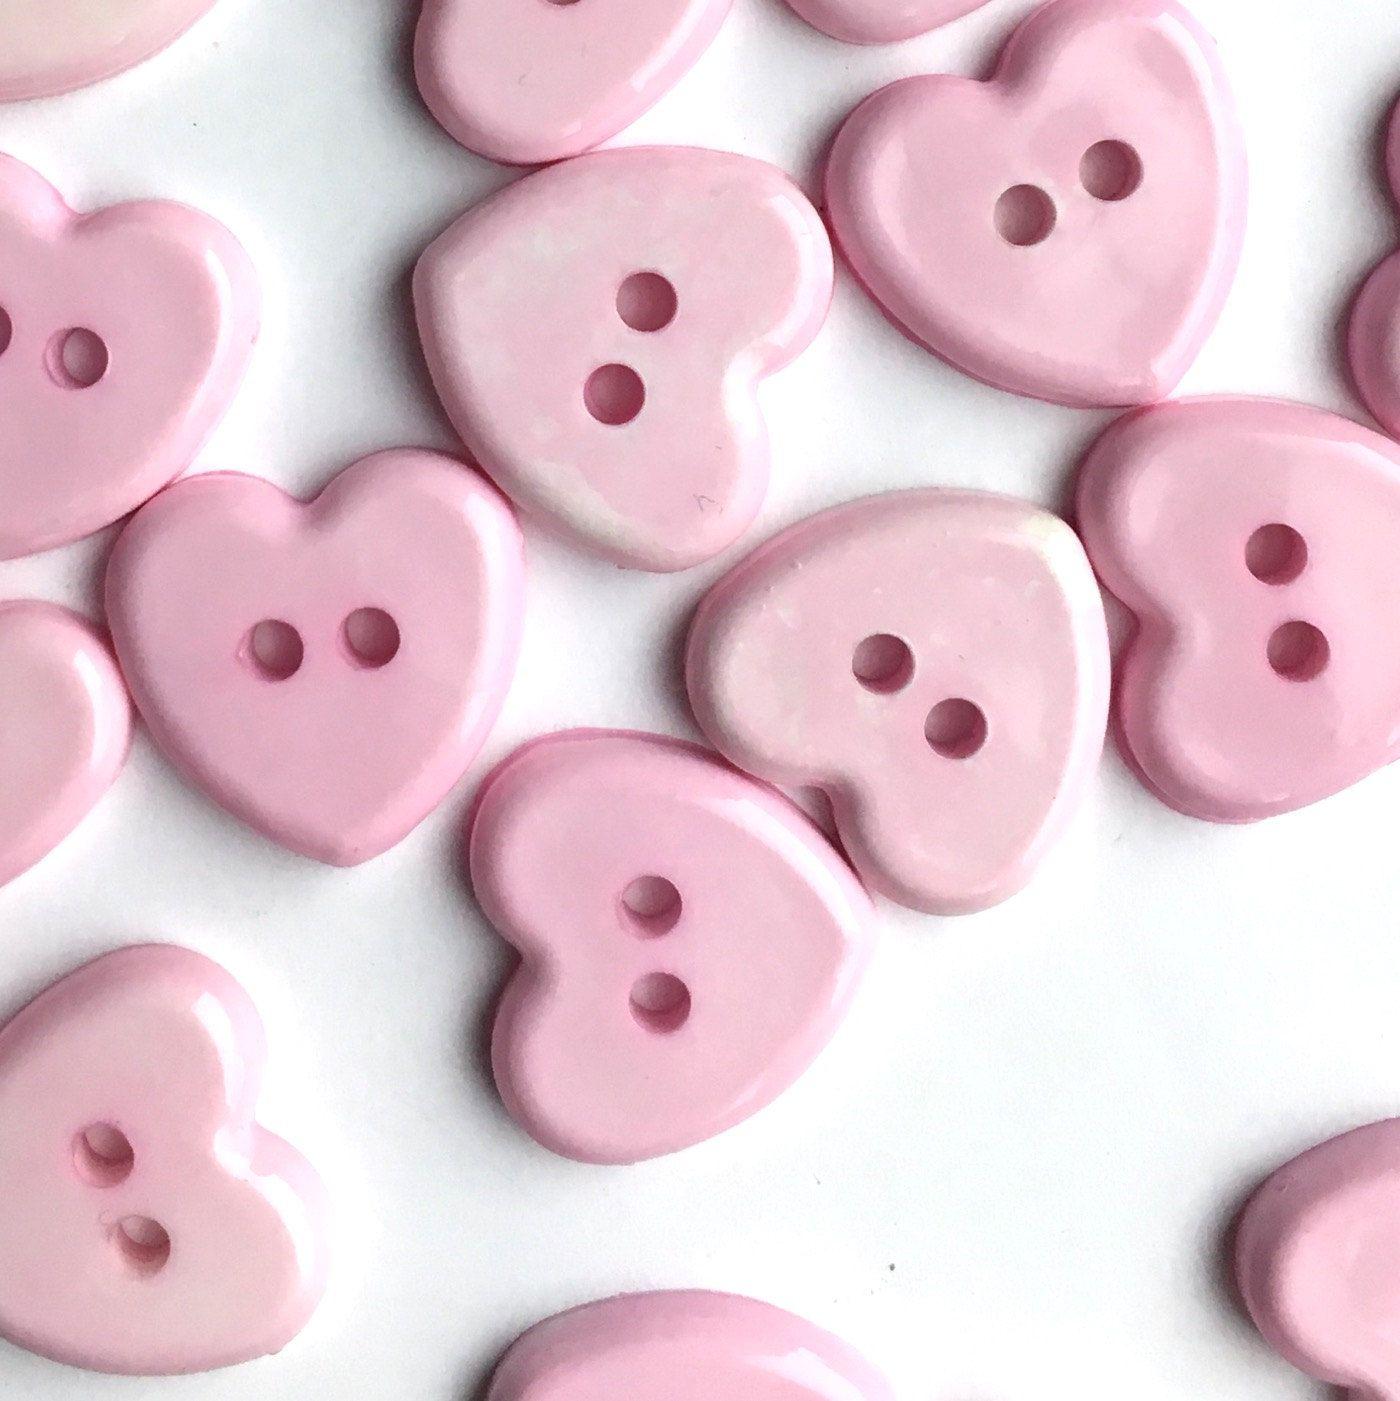 10 x white opalescent heart buttons 18L 11mm UK seller